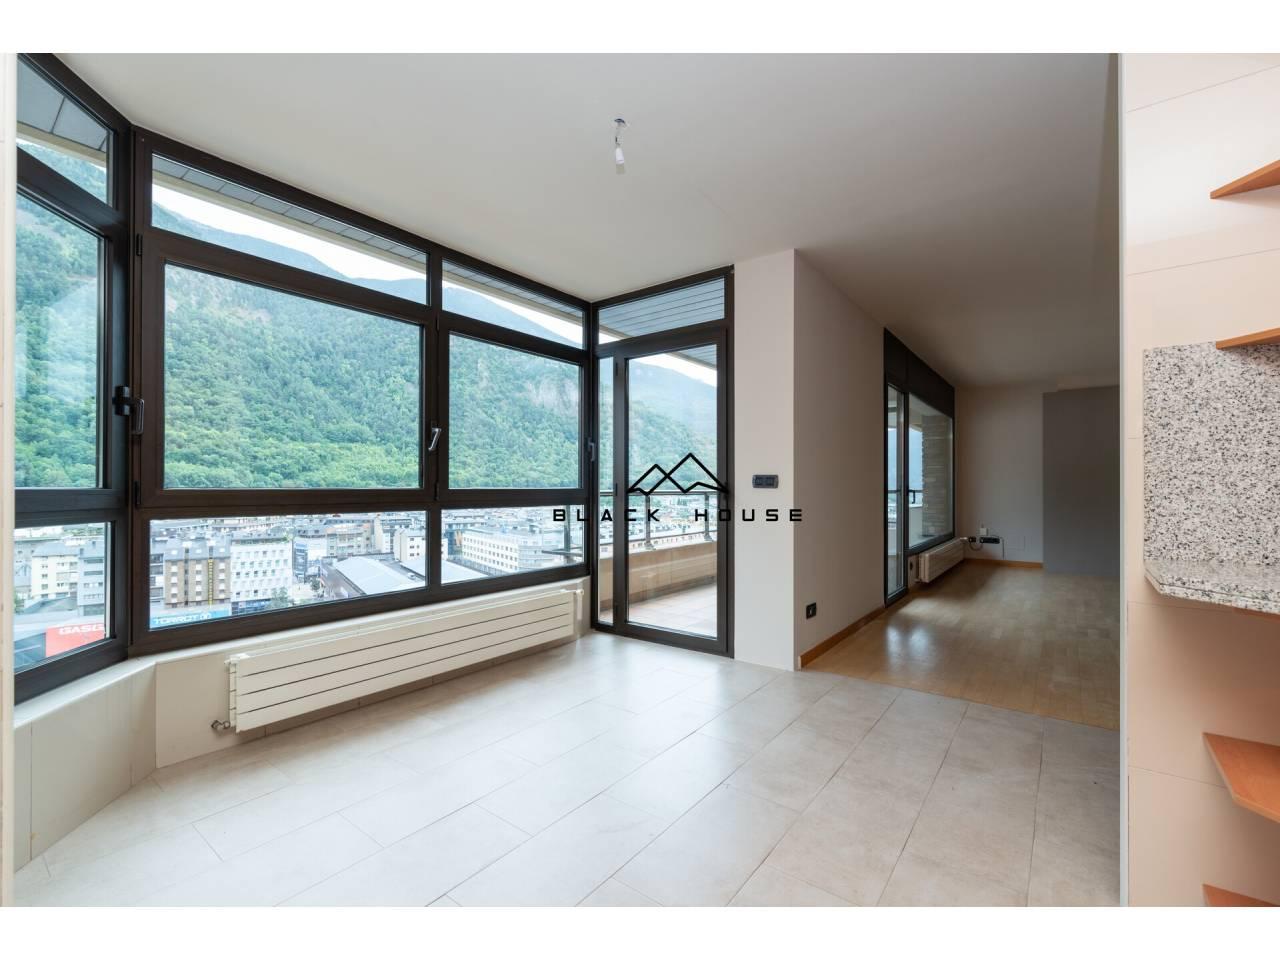 Luxós àtic en venda a Andorra la Vella.